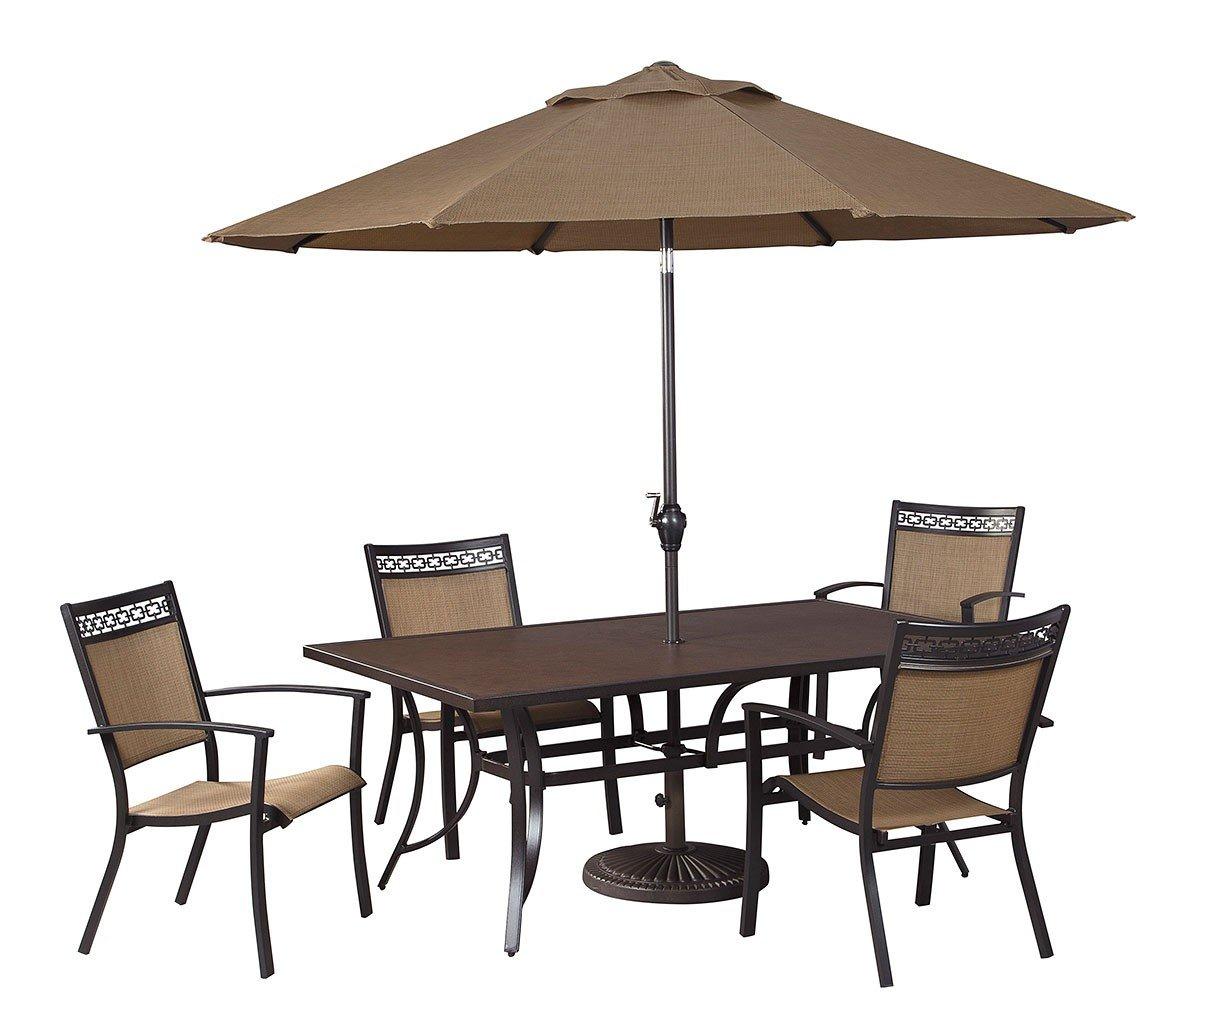 carmadelia outdoor dining set w umbrella signature design furniture cart. Black Bedroom Furniture Sets. Home Design Ideas